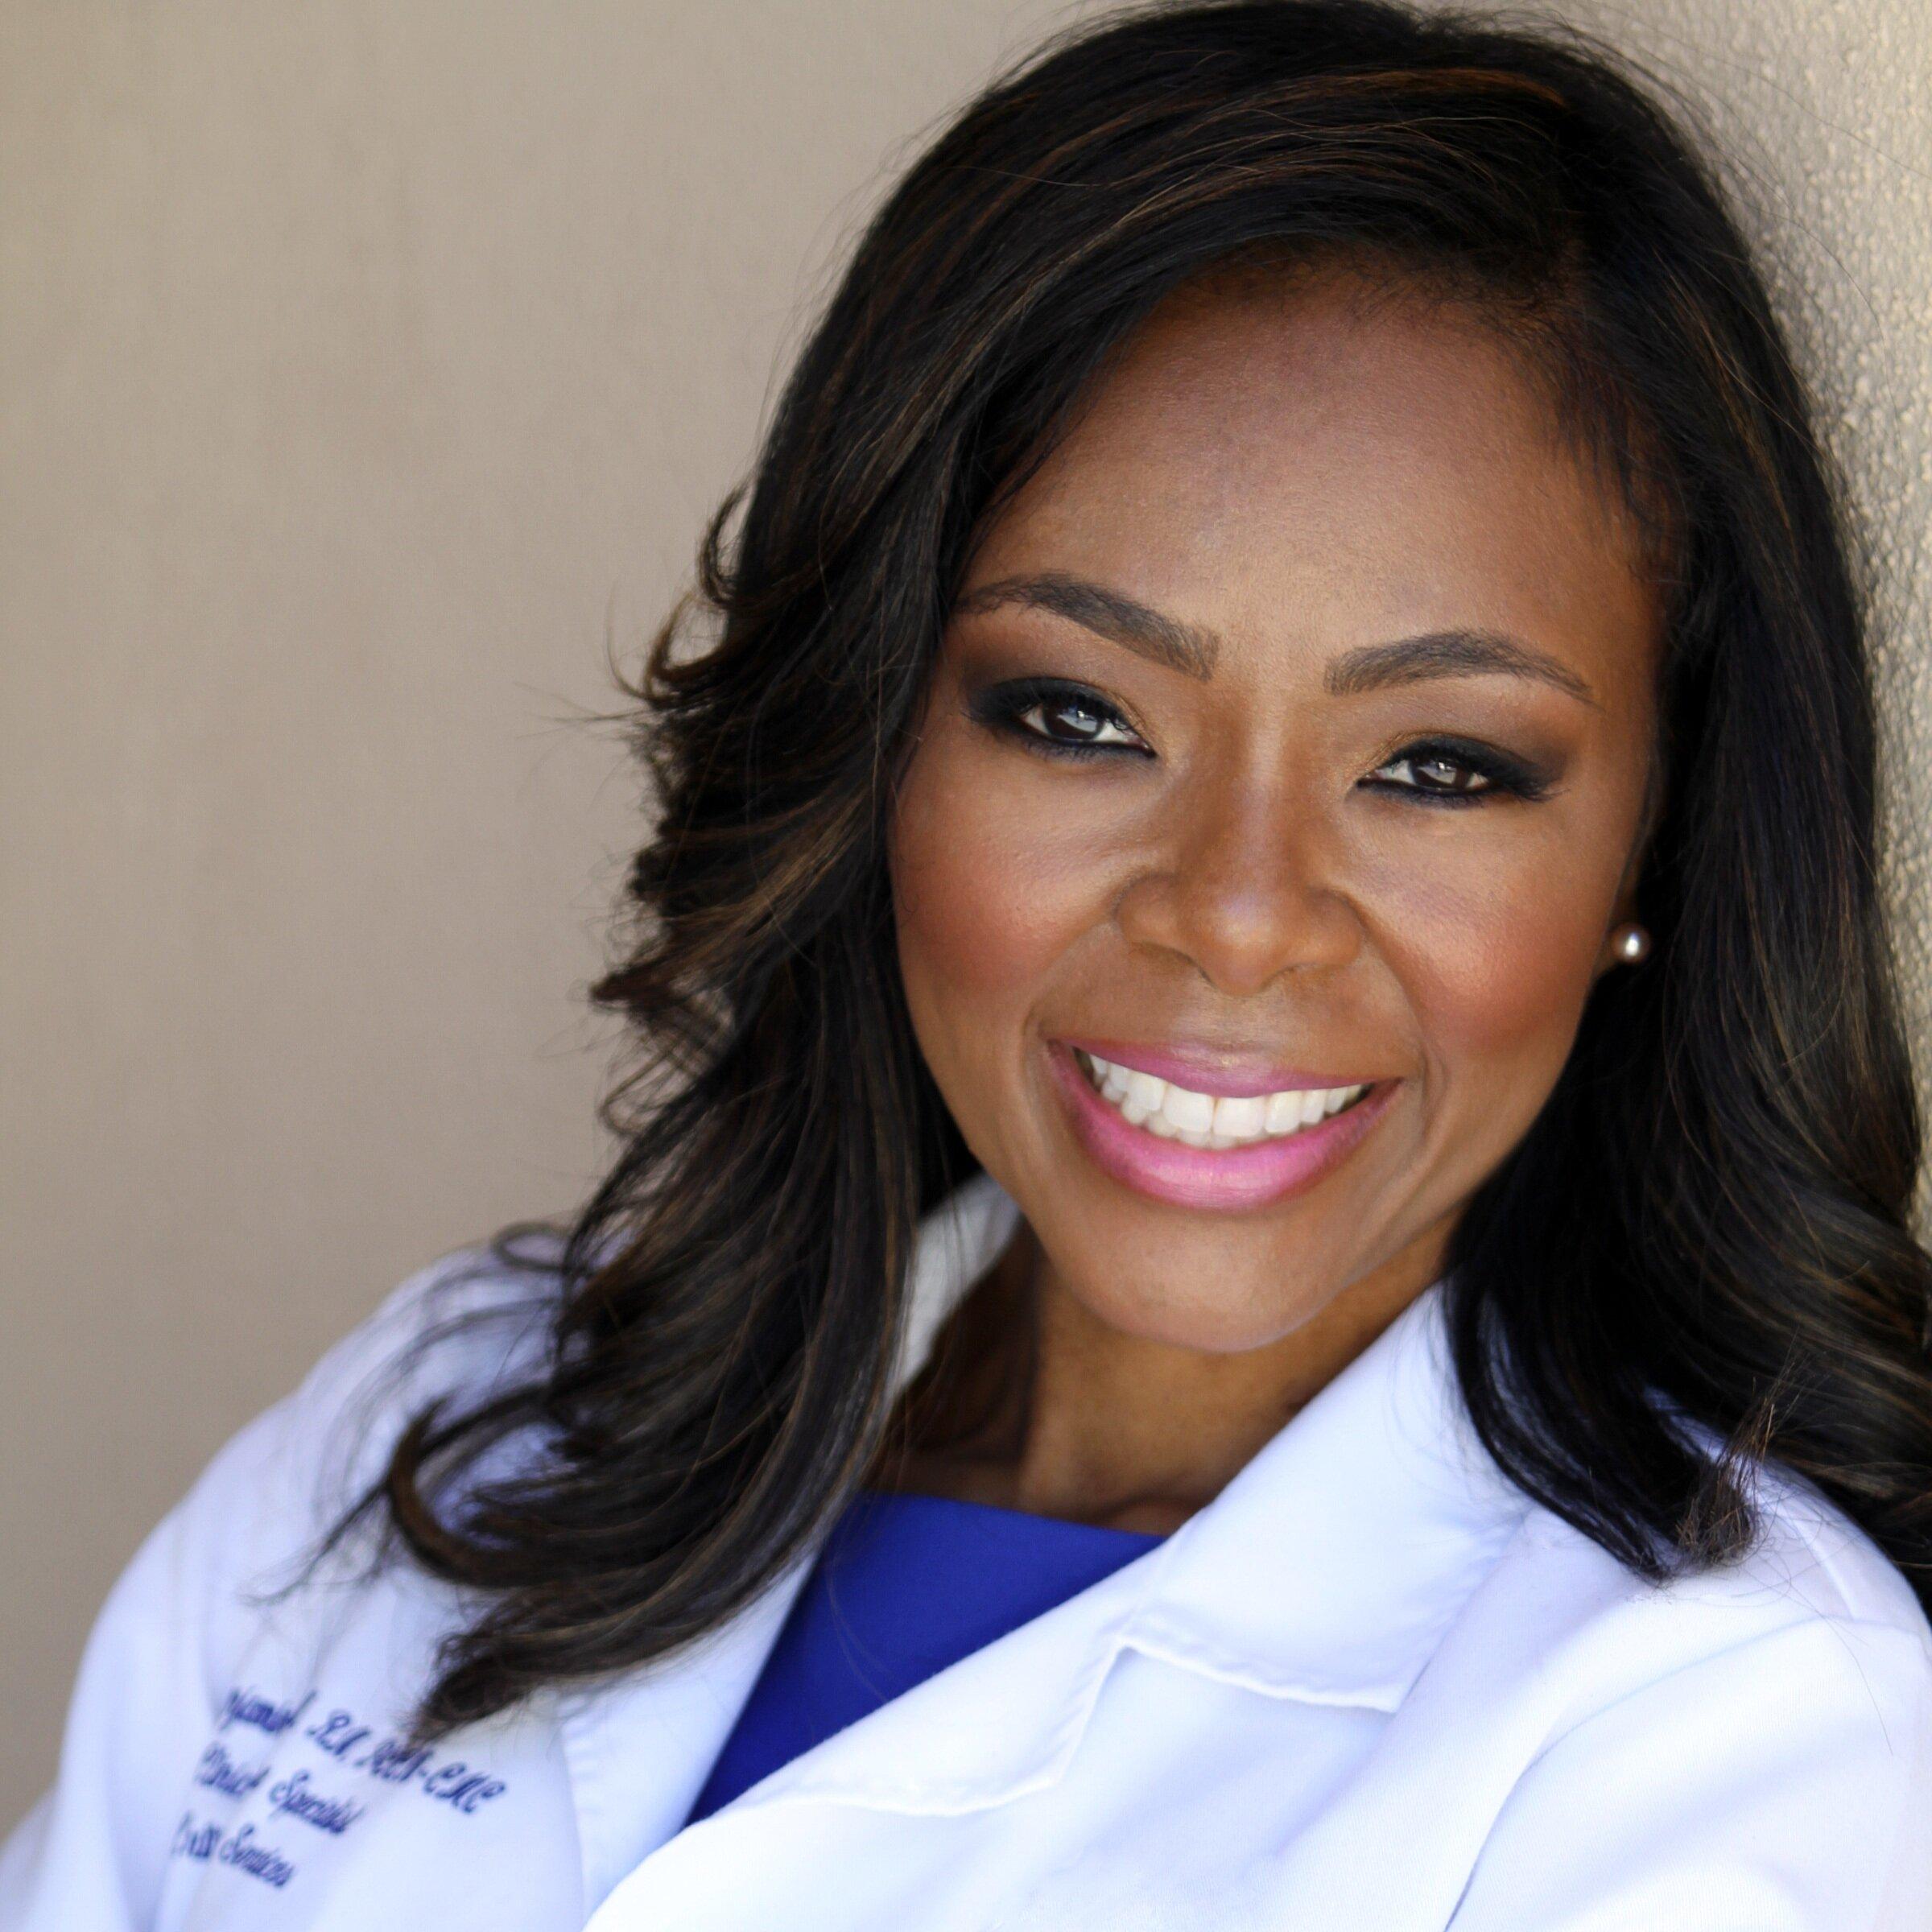 Nurse+Alice+white+lab+coat.jpg